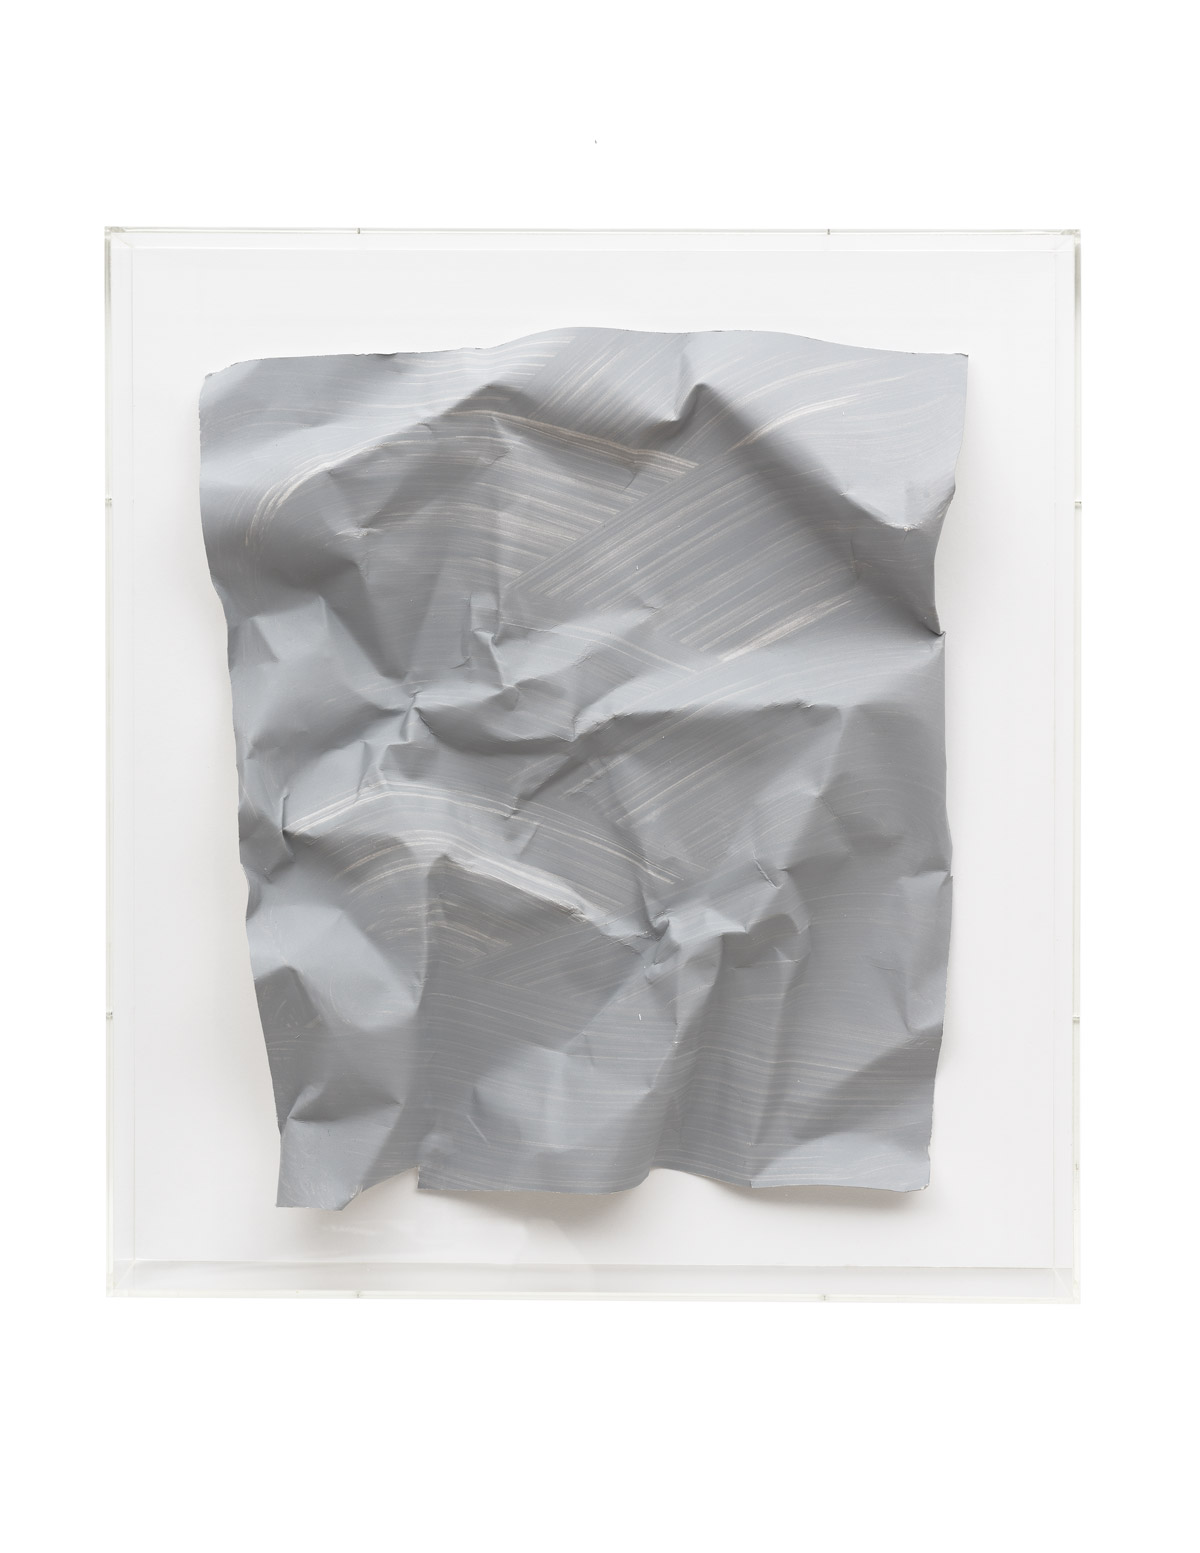 Özcan Kaplan Papierarbeit kriesgrau 2 April 2018 Dispersion paint ink paper 67 x 585 x 8 cm 1